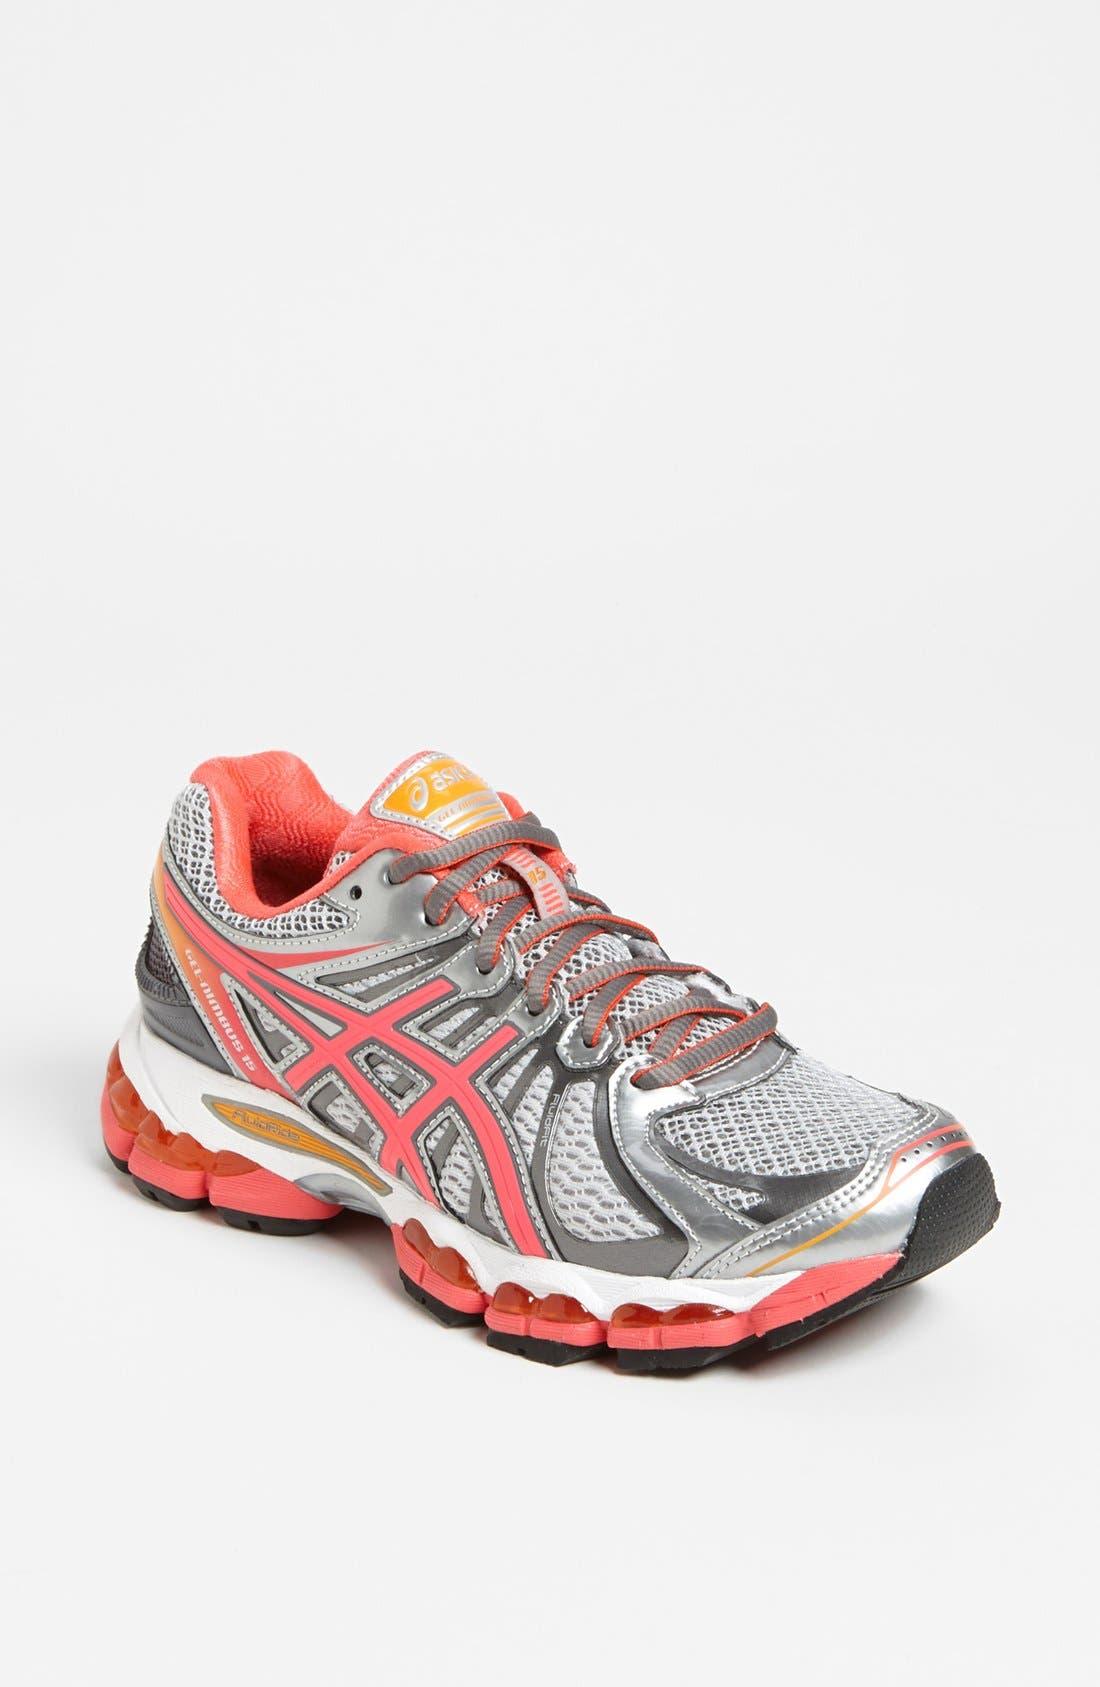 Main Image - ASICS® 'GEL-Nimbus 15' Running Shoe (Women)